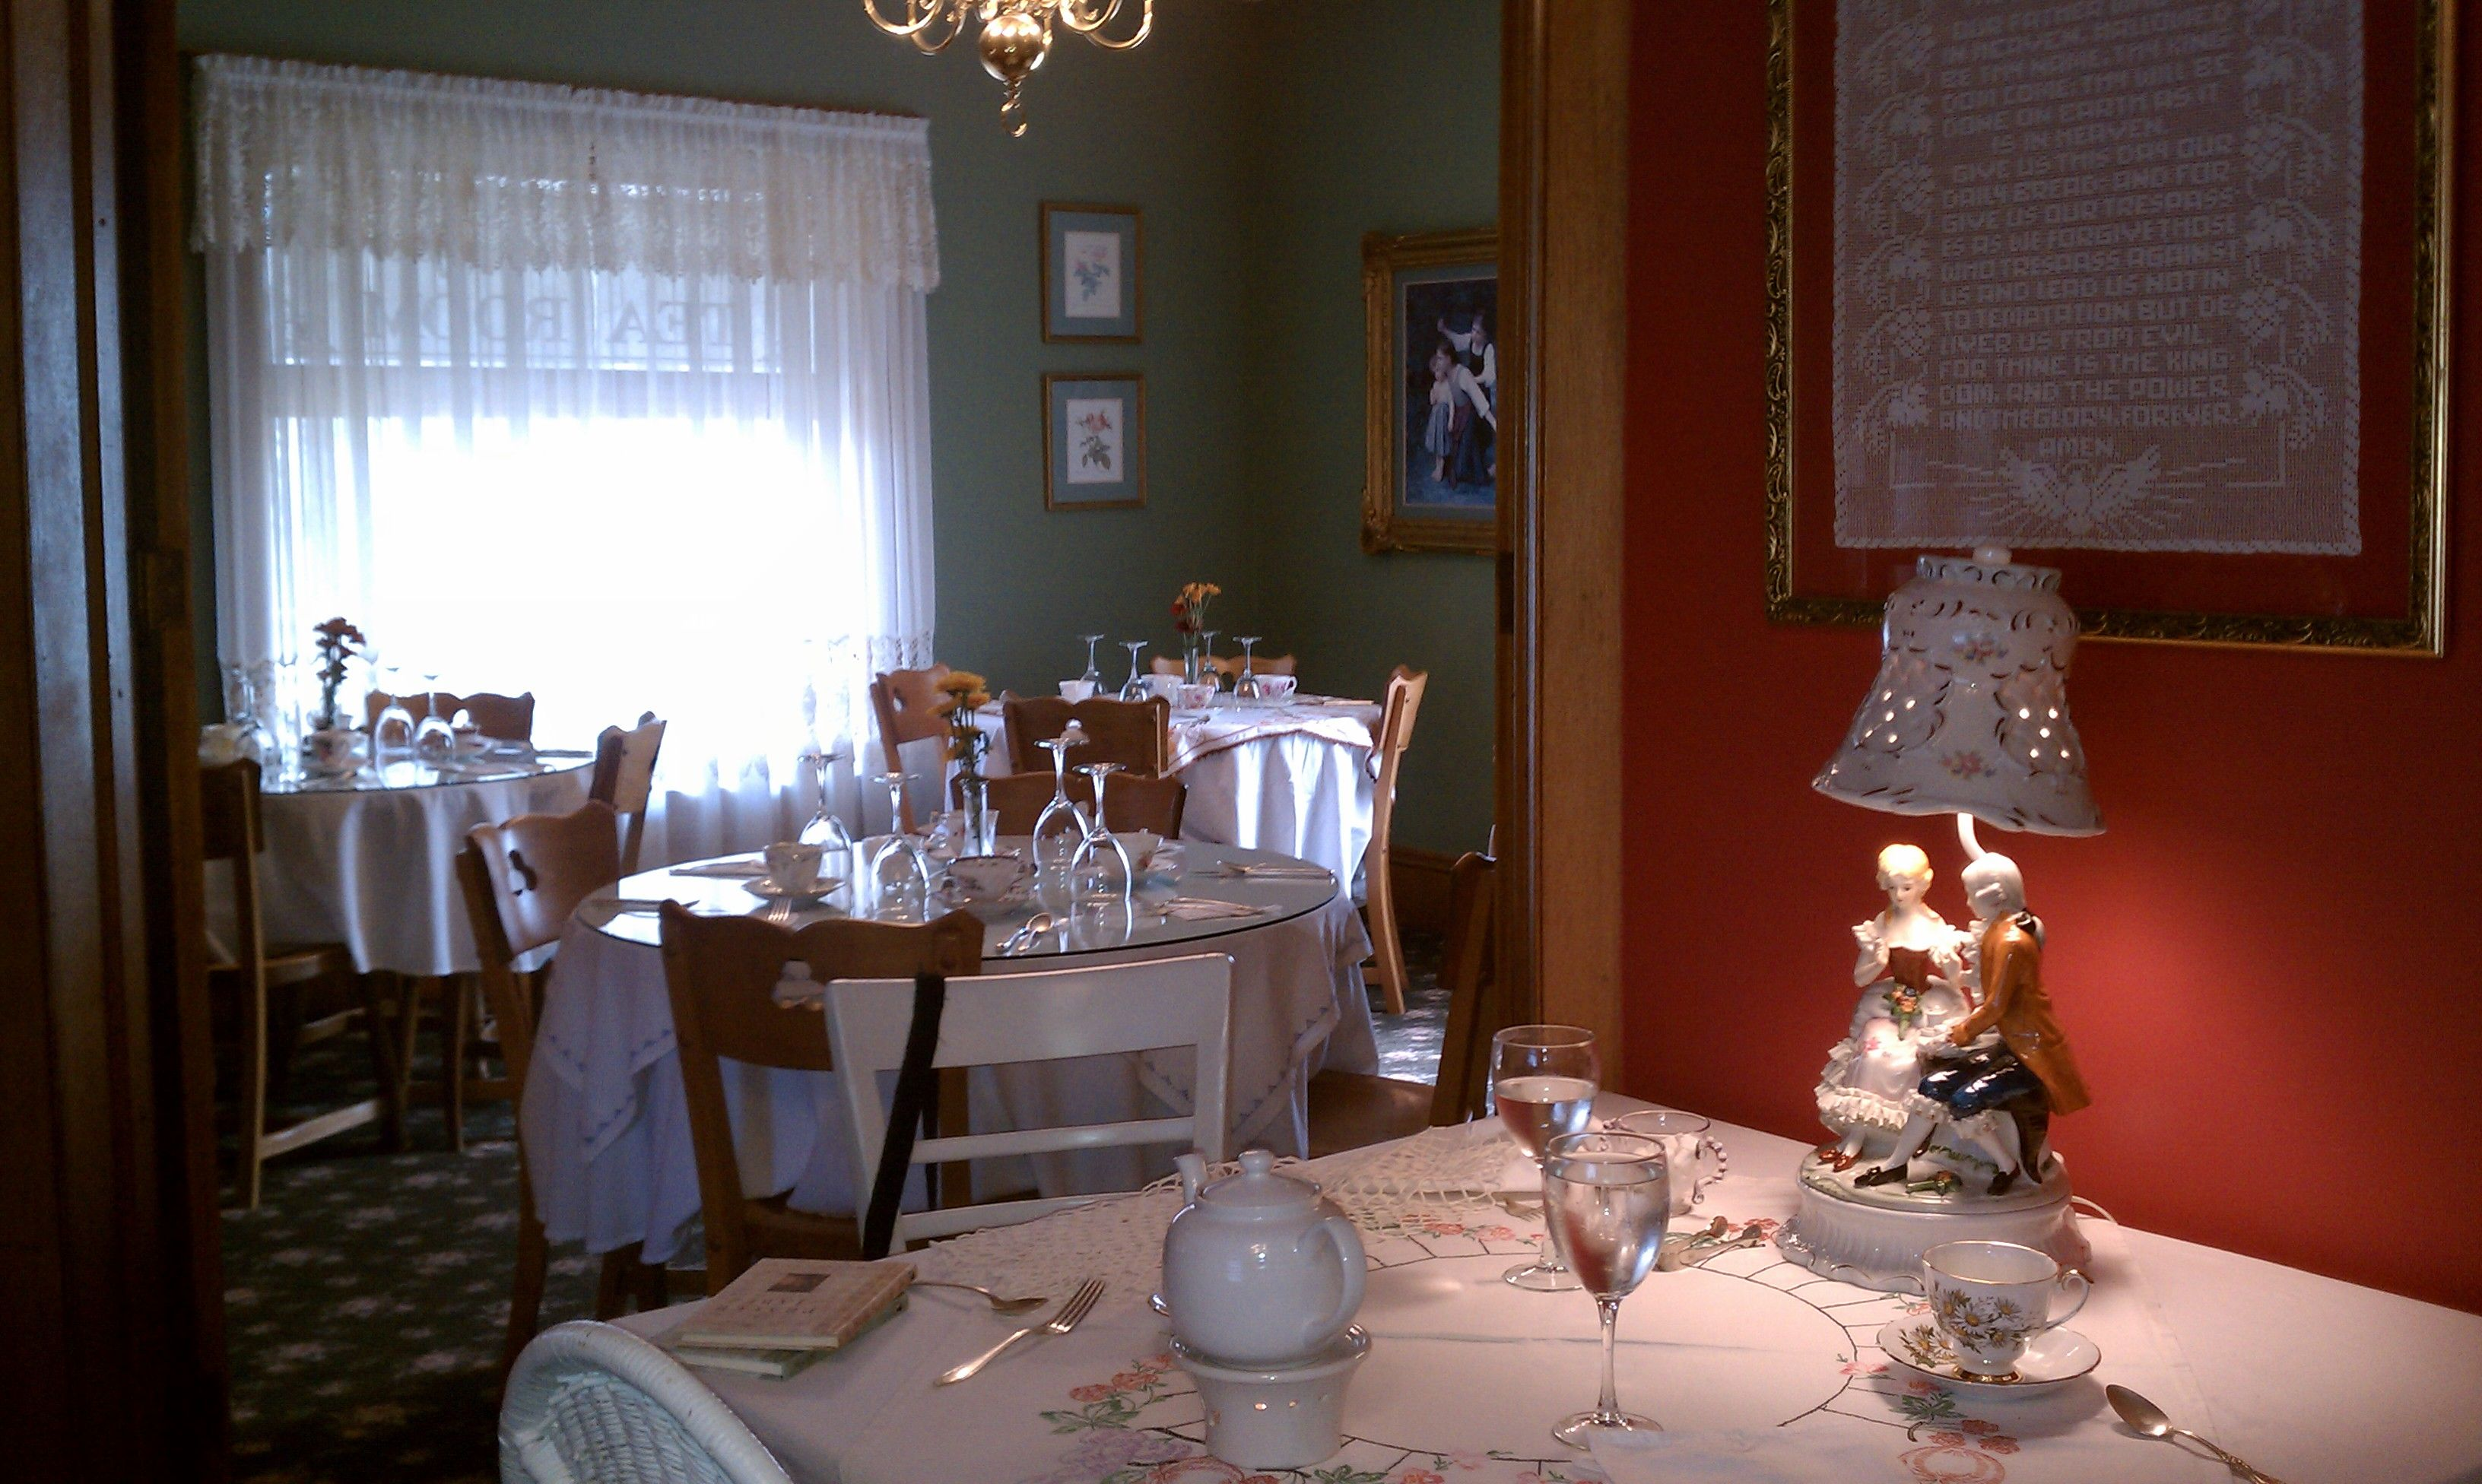 Tyme Well Spent Tea Room In Hartland Mi Http